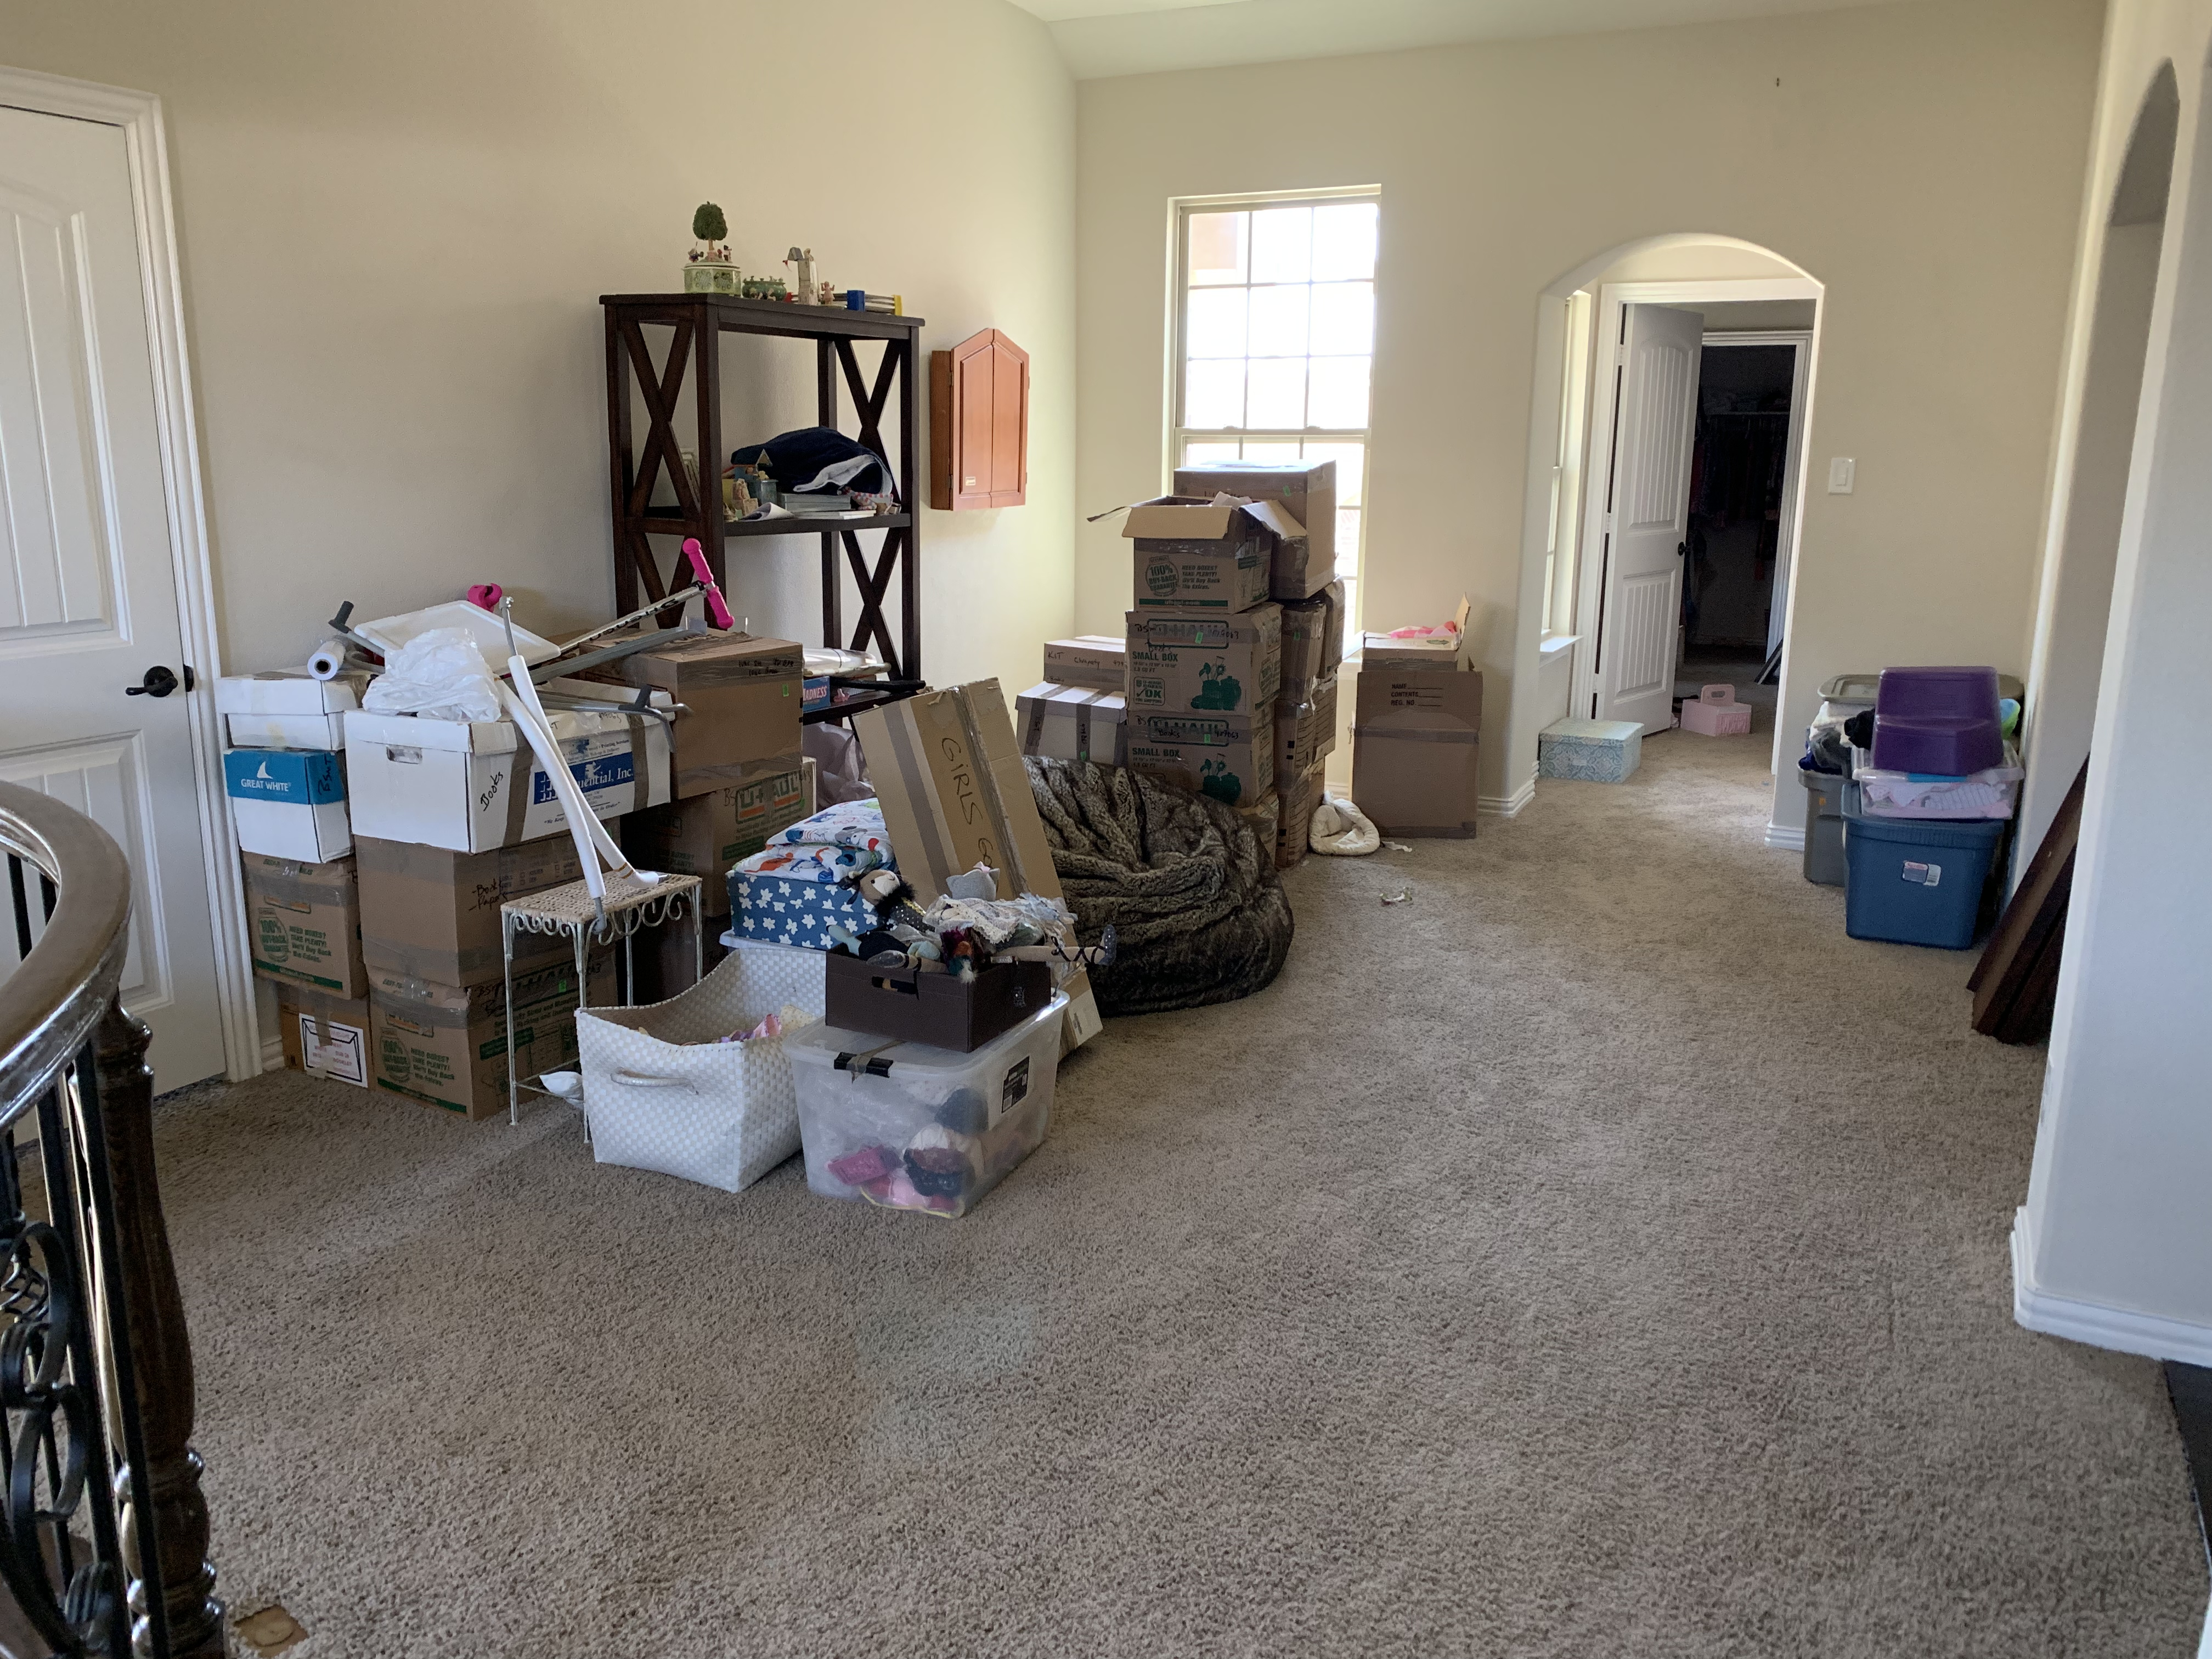 Unpacking (in progress)